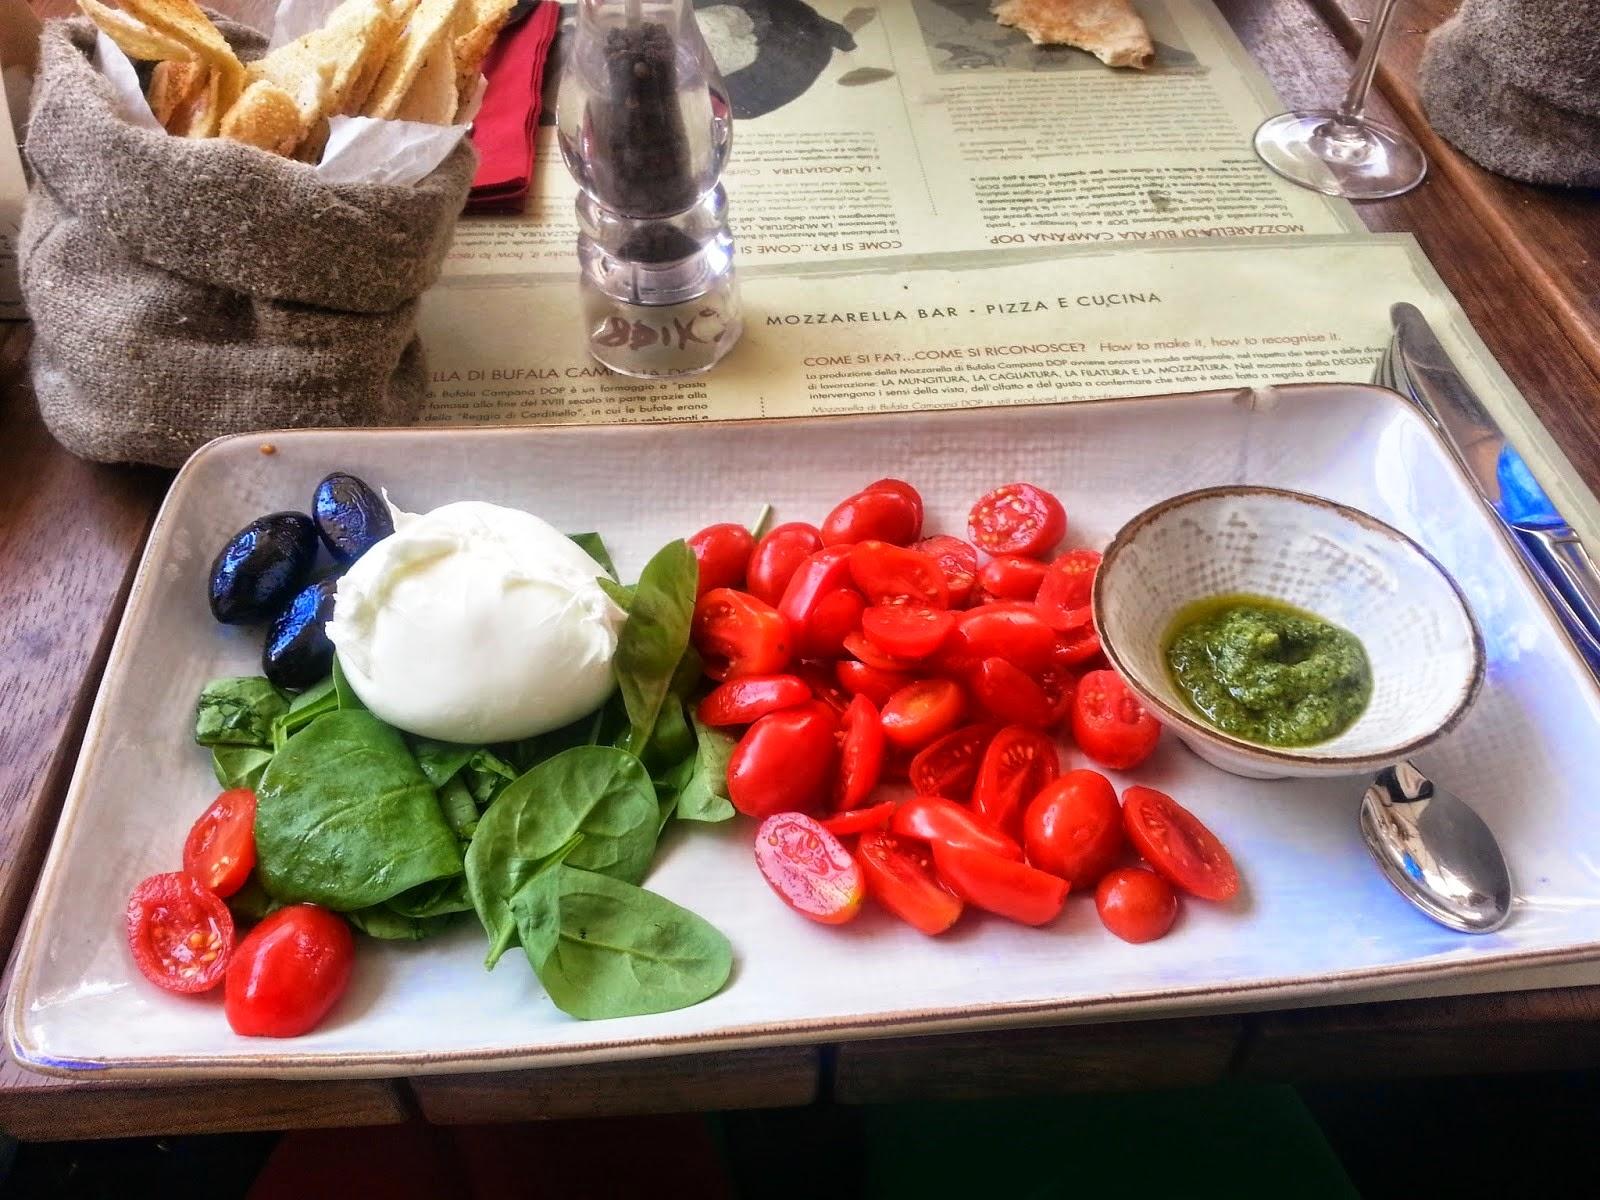 E aqui, Mozzarella di Búfala Campana DOP, pomodori di Pachino com pesto di basílico.